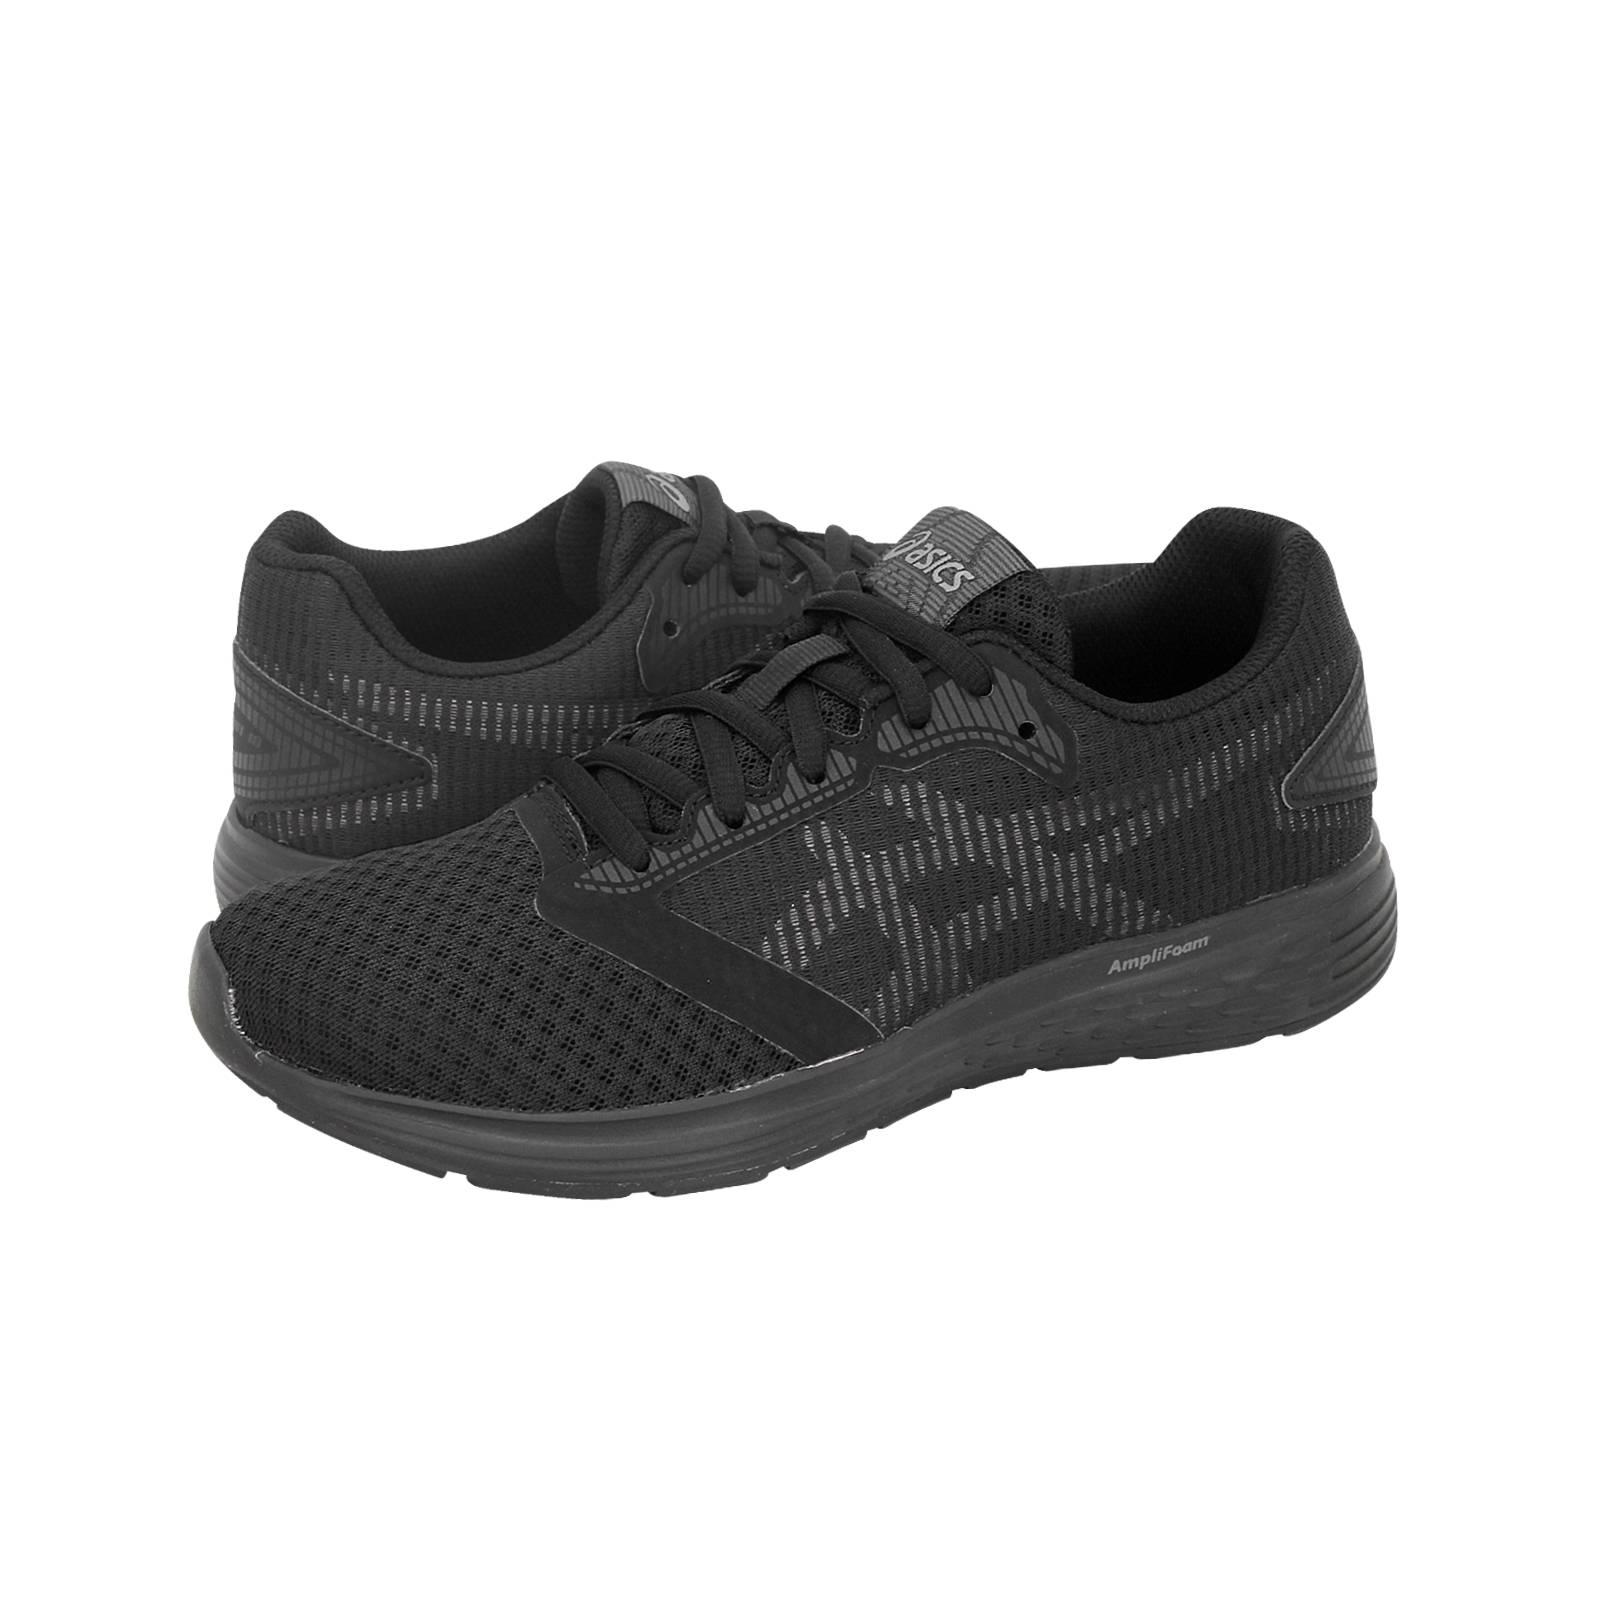 ef4b2e45486 Patriot 10 GS Lite-Show - Παιδικά αθλητικά παπούτσια Asics από ...